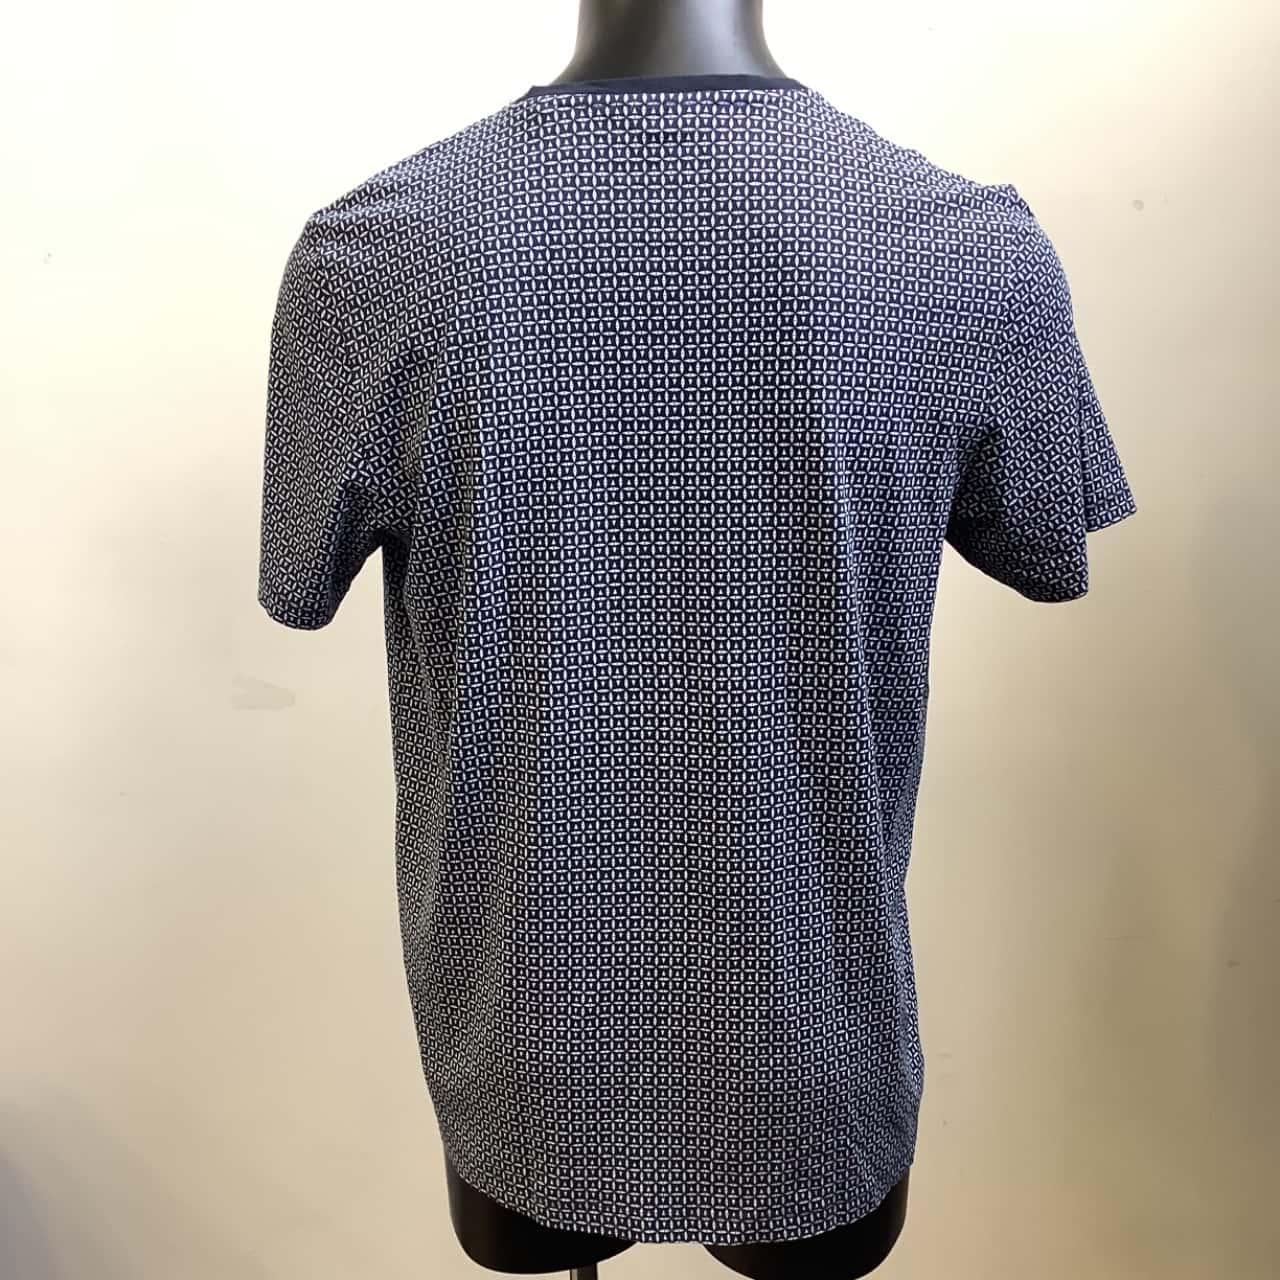 NEXT Mens  Size UK: XL Navy Blue/Pattern Regular Fit Cotton Tee